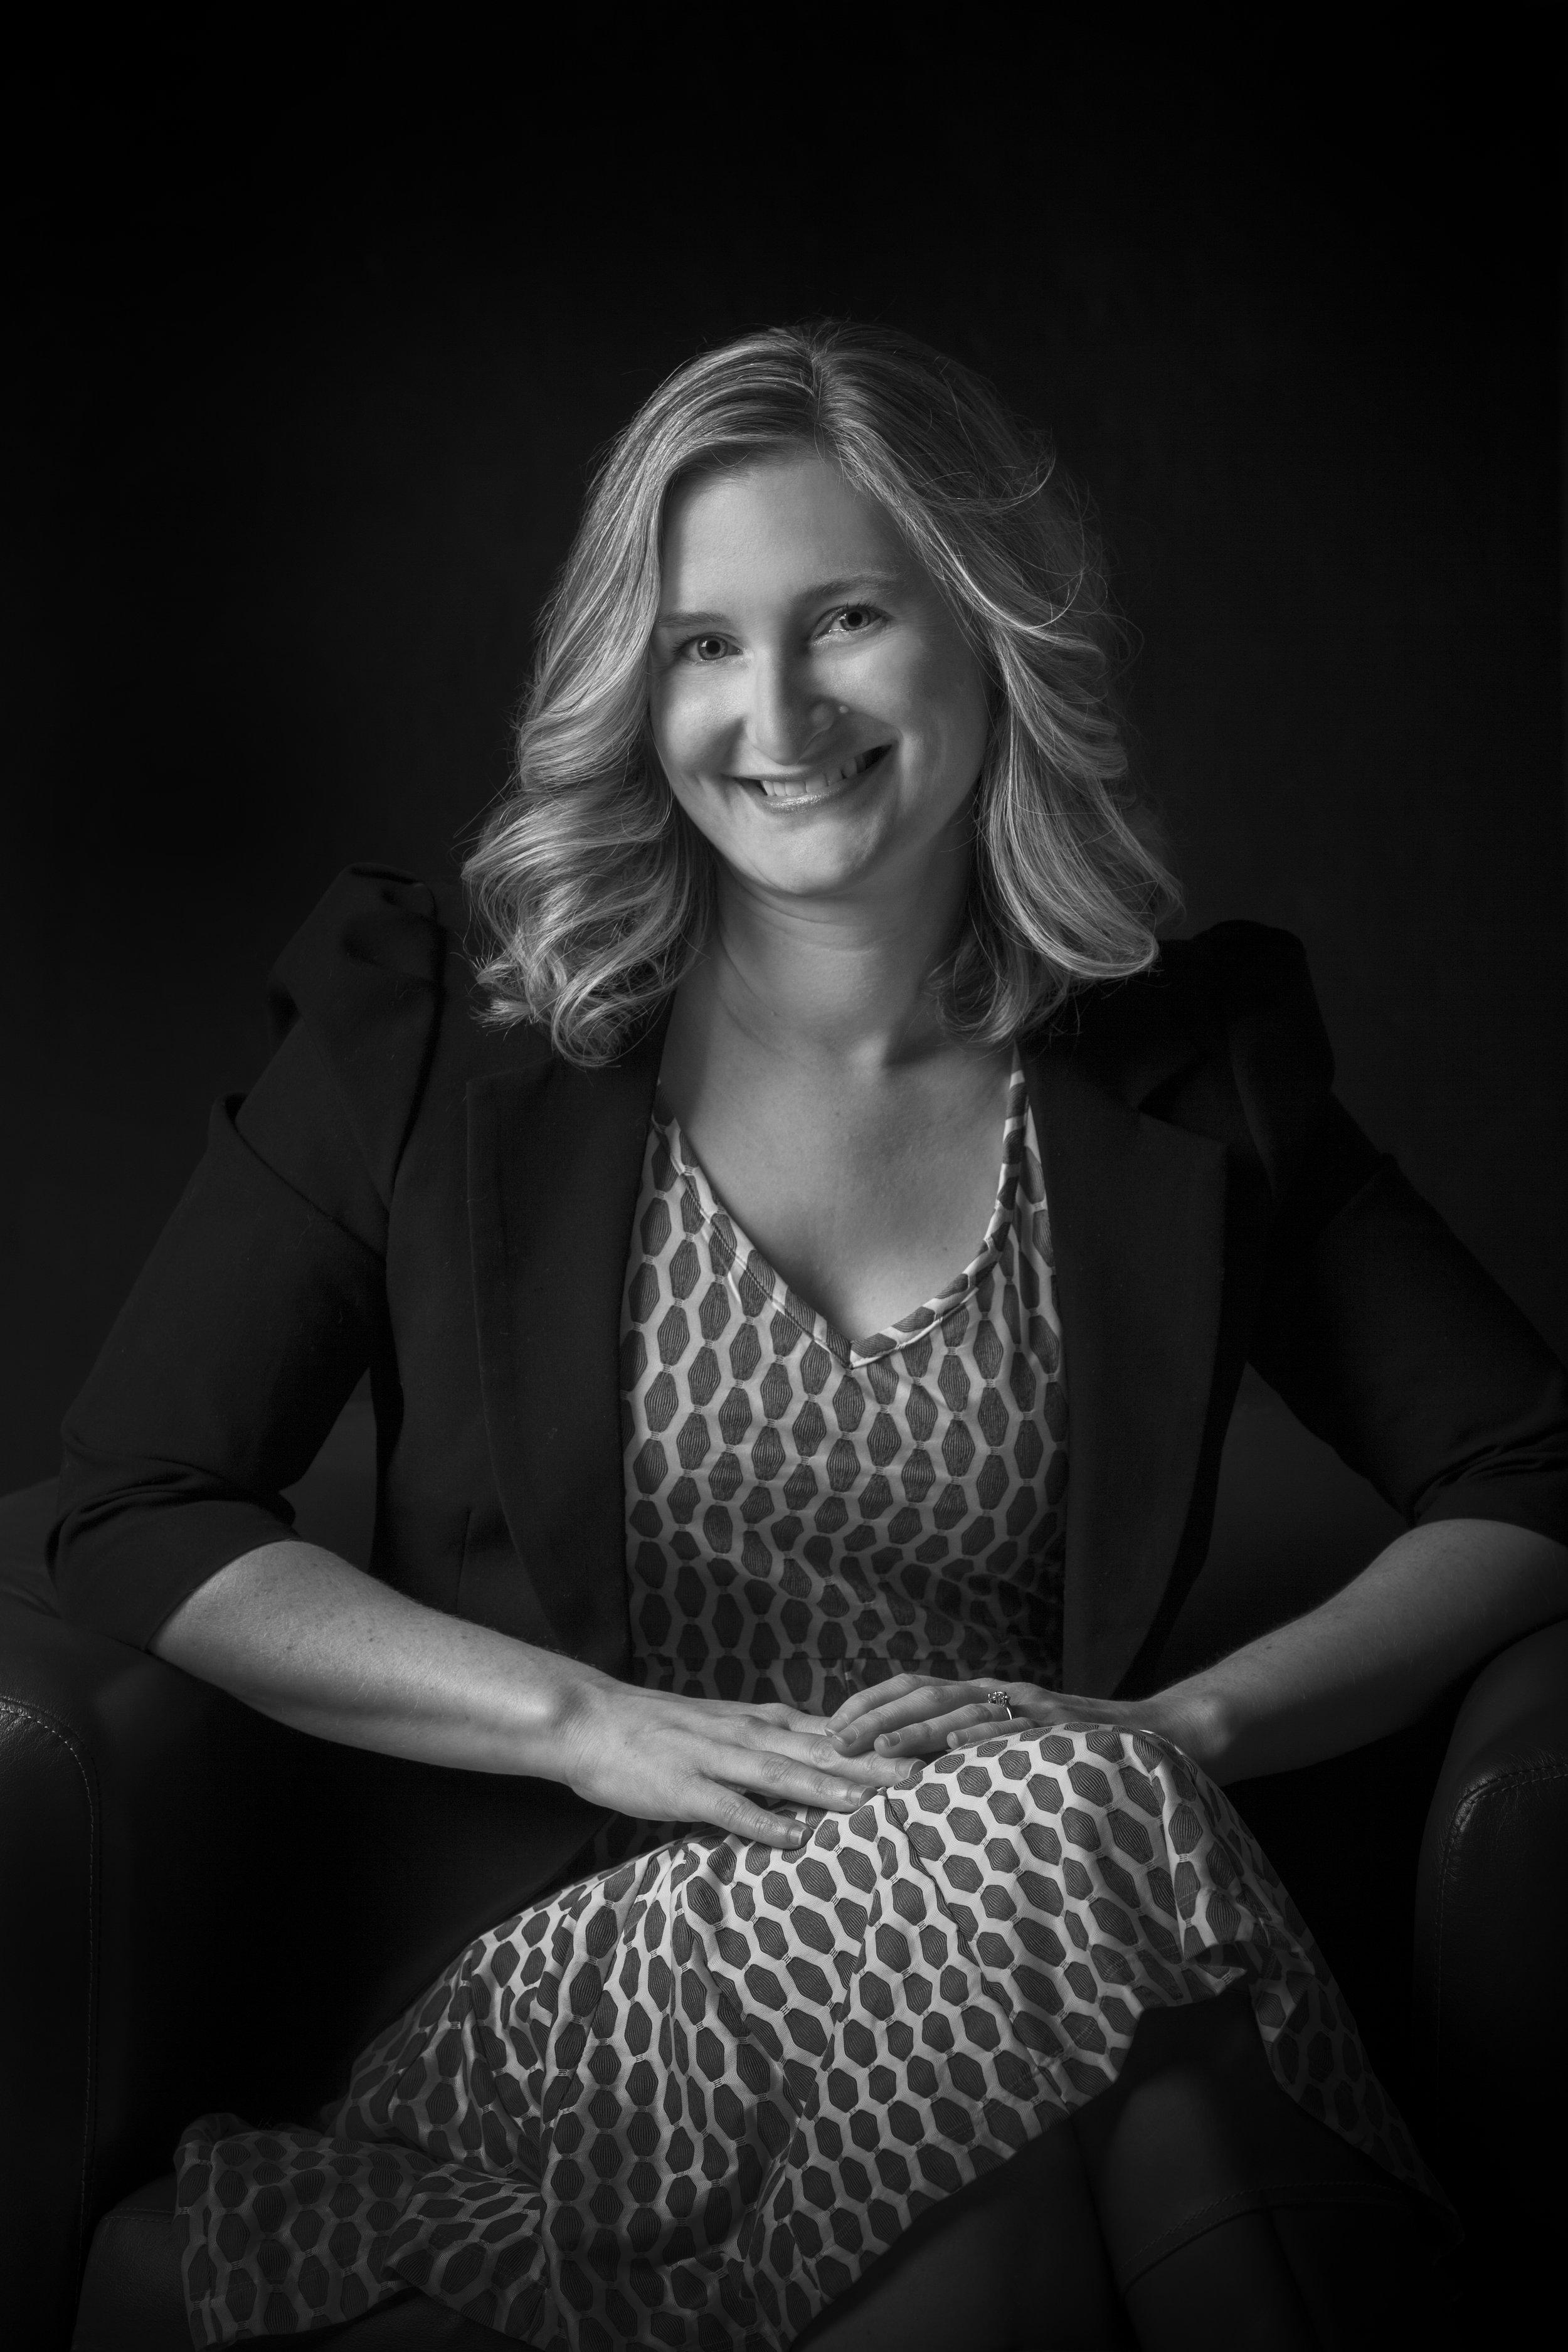 High-resolution author photo of Emily Bain Murphy